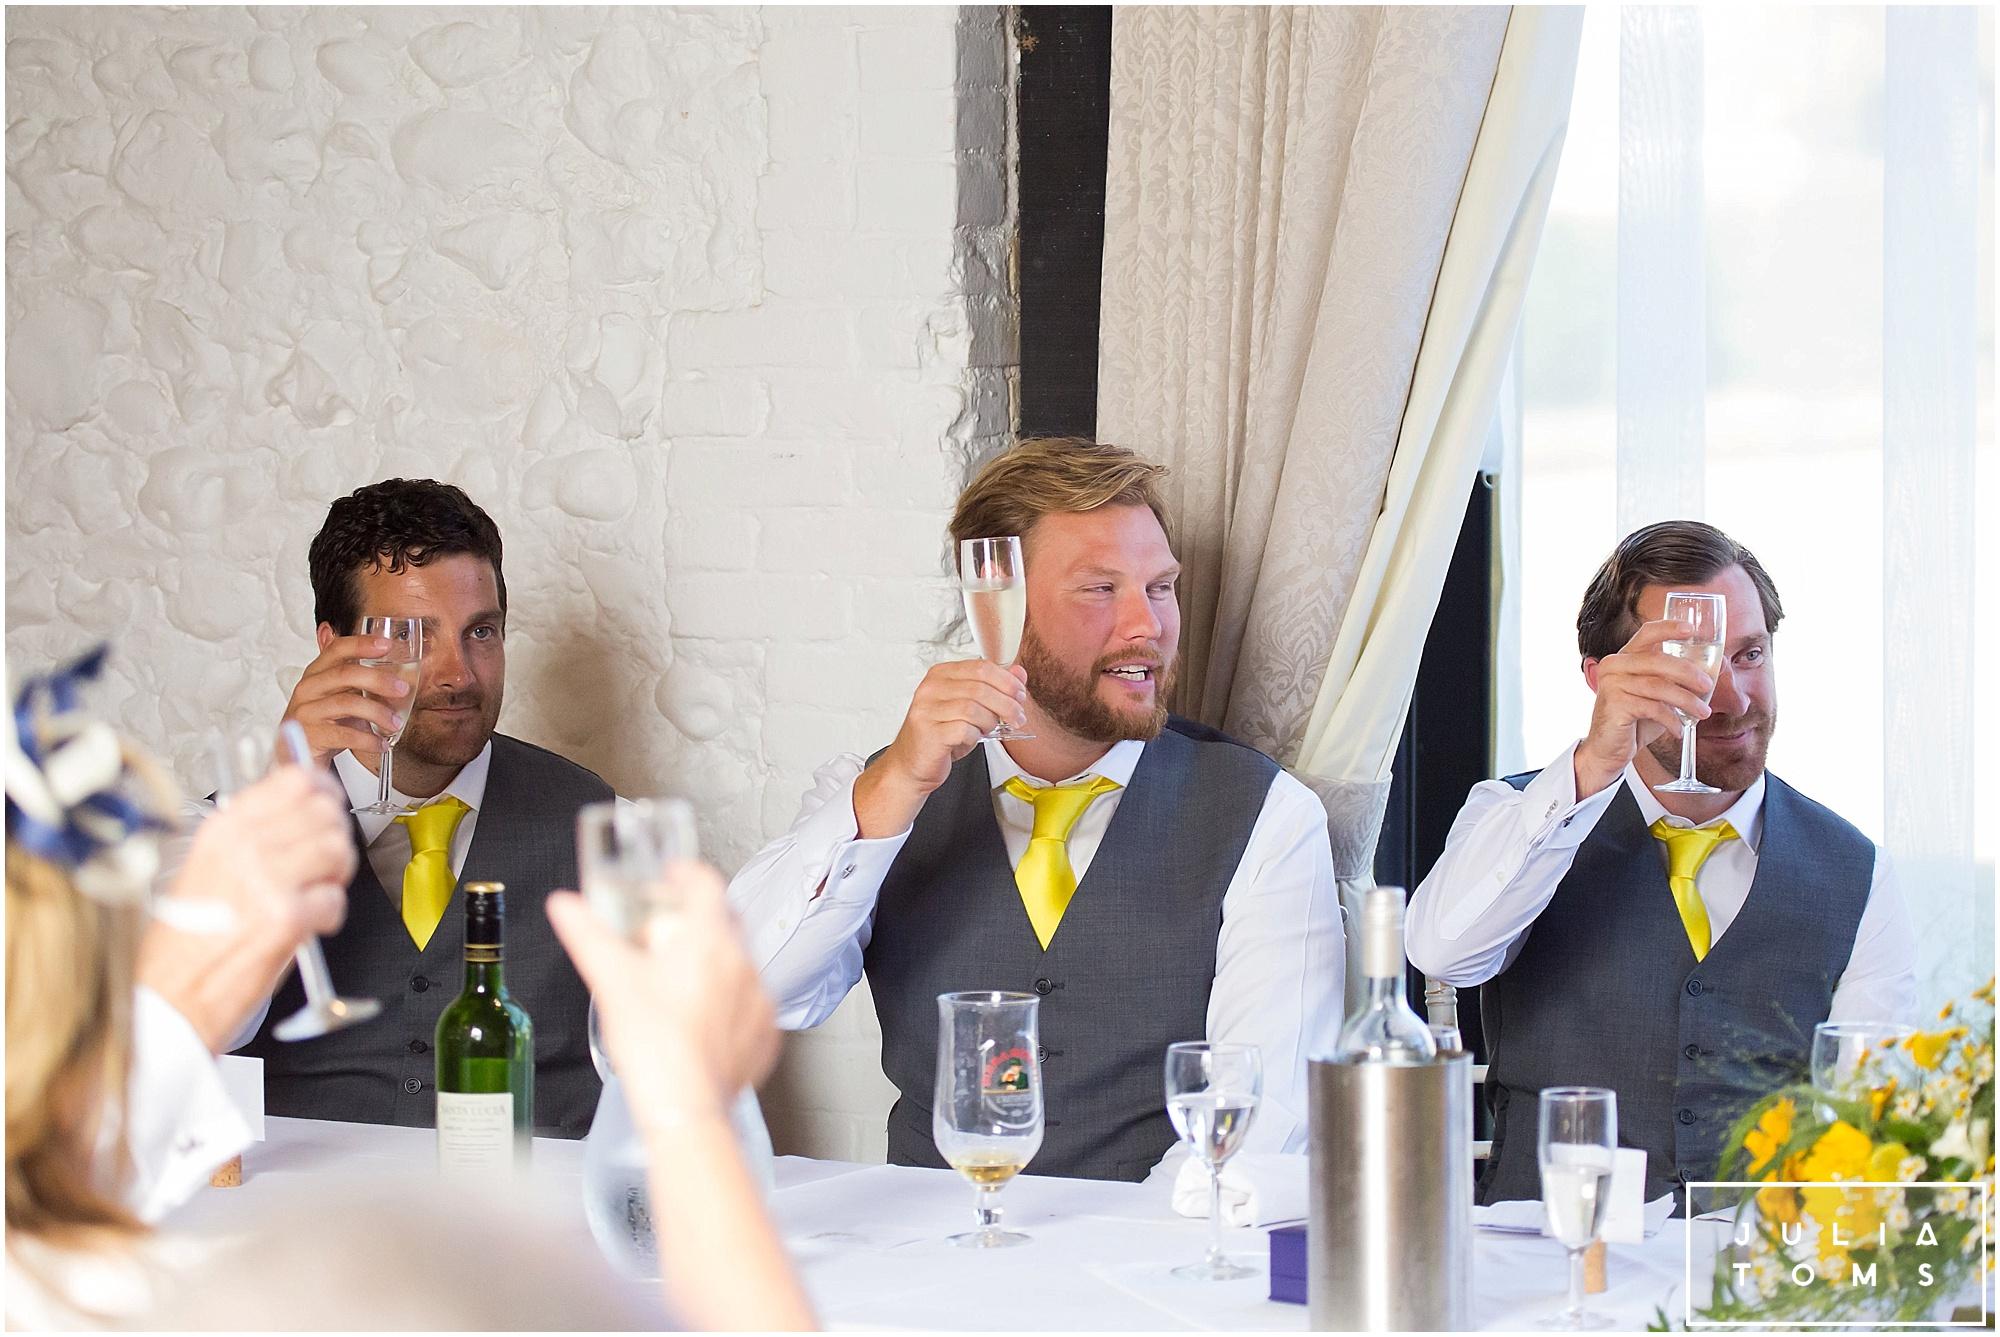 julia_toms_chichester_wedding_photographer_worthing_075.jpg